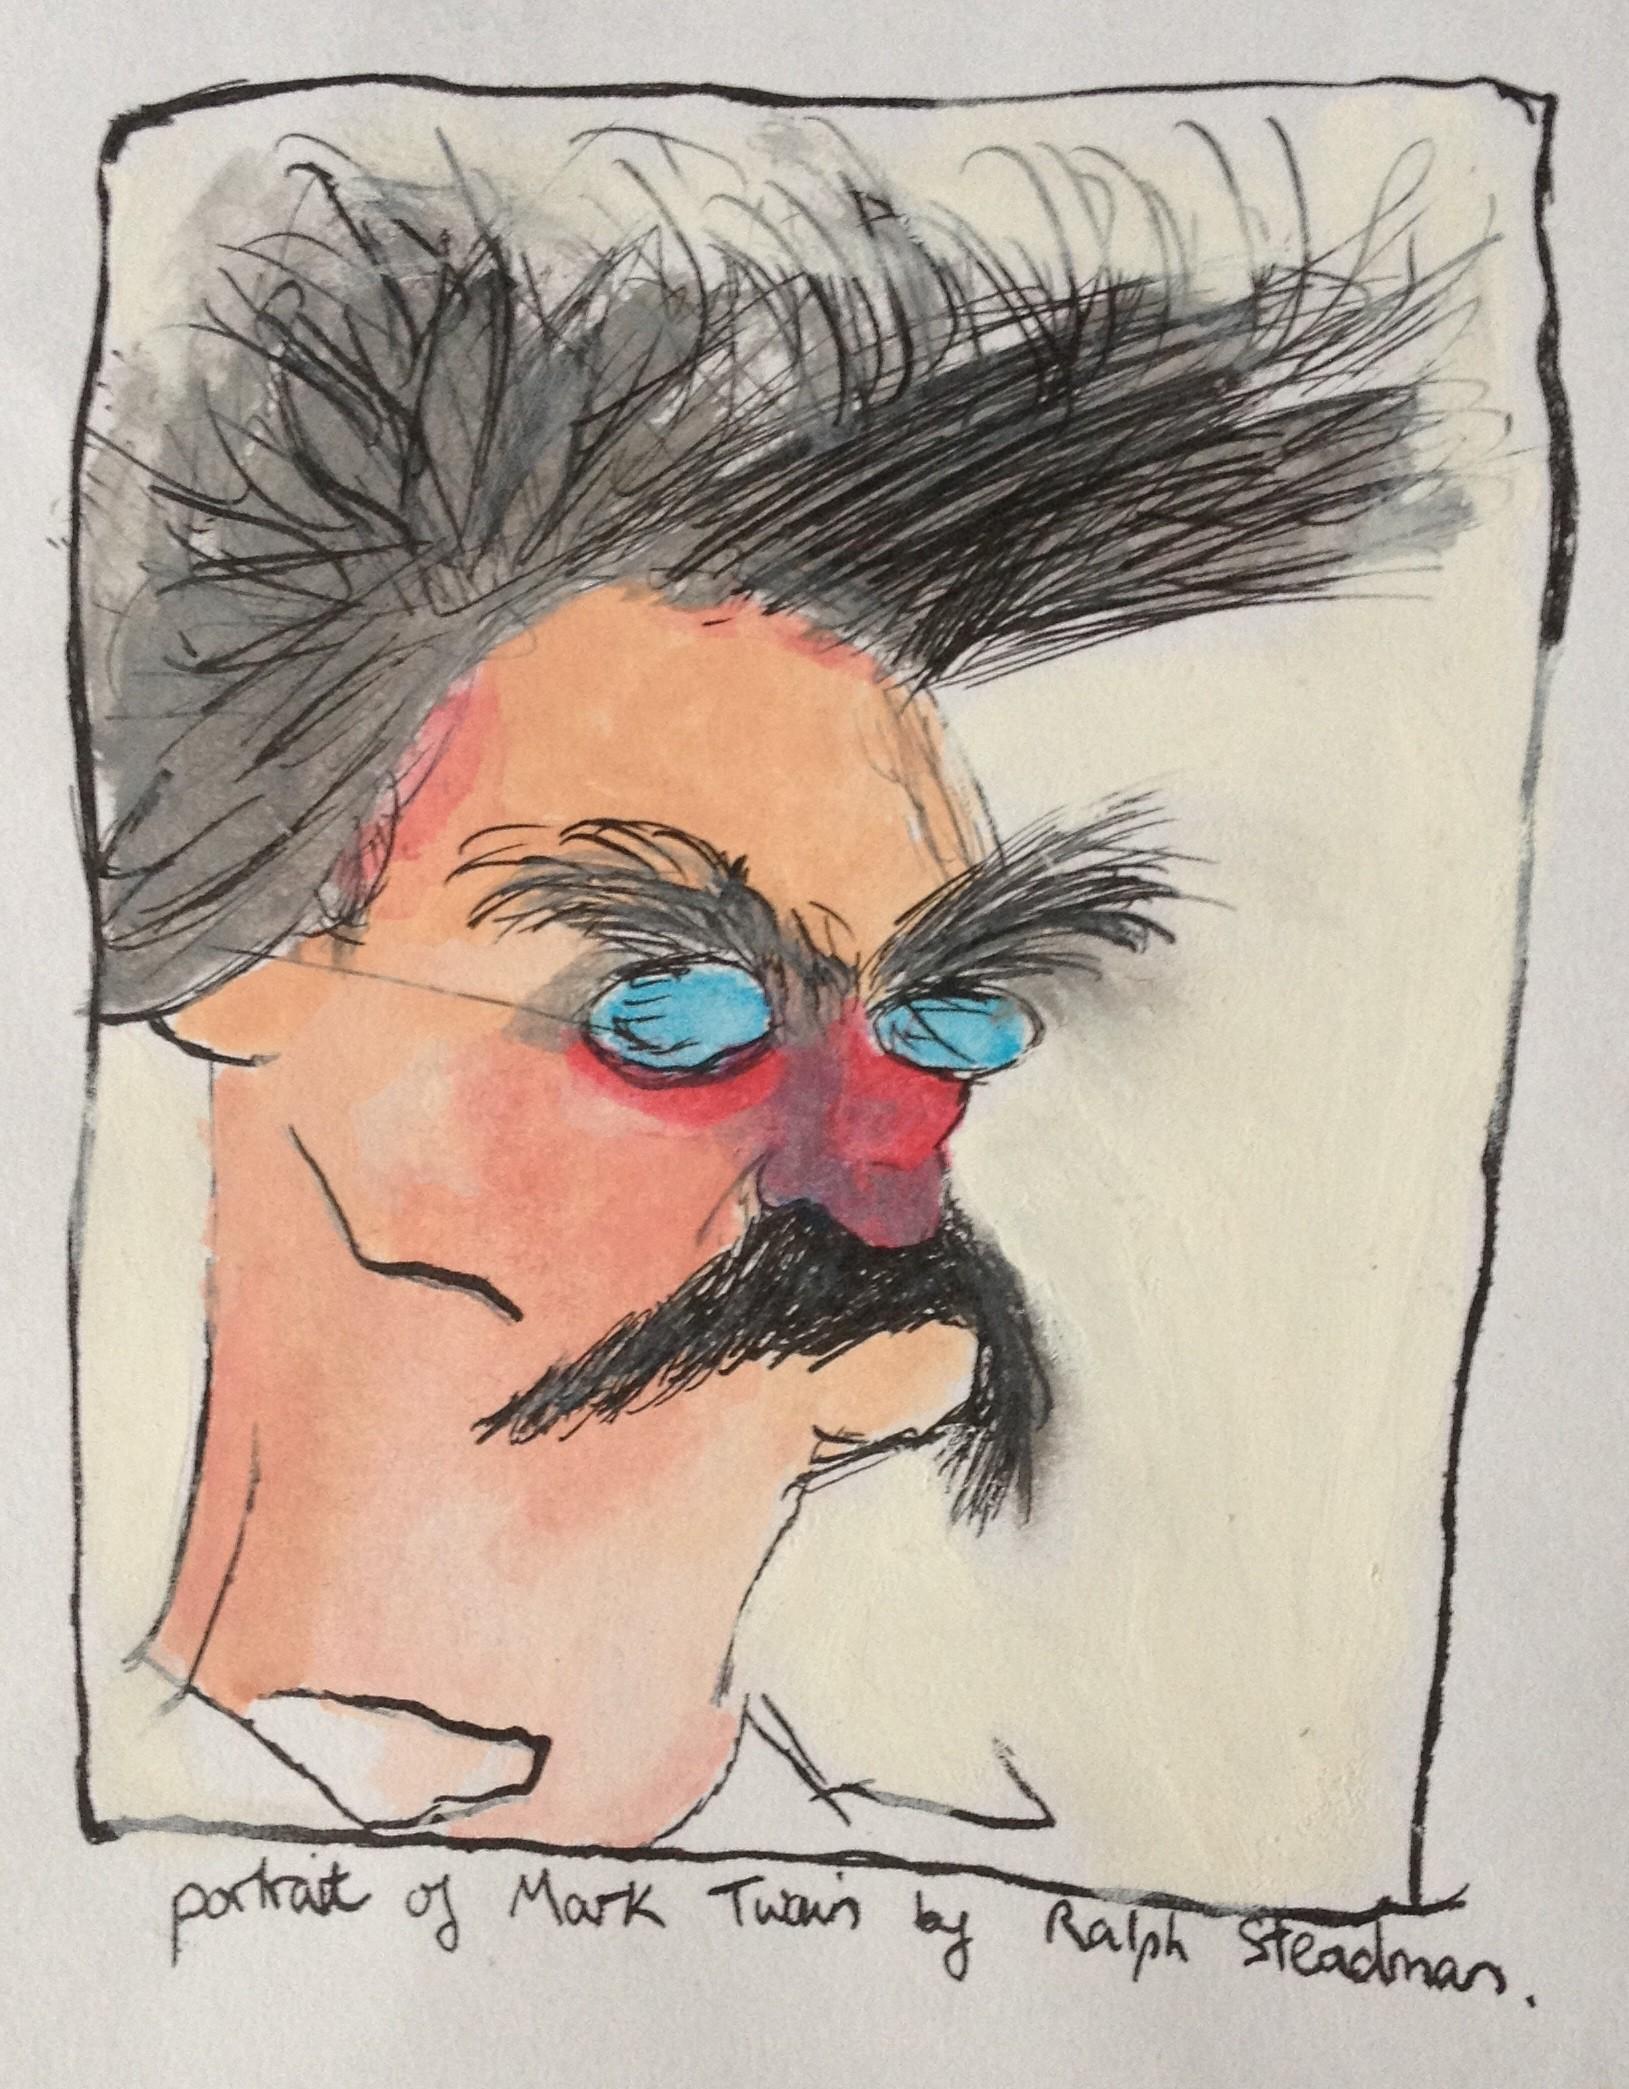 Res: 1629x2089, ... Portrait of Mark Twain by Ralph Steadman by Spannah88